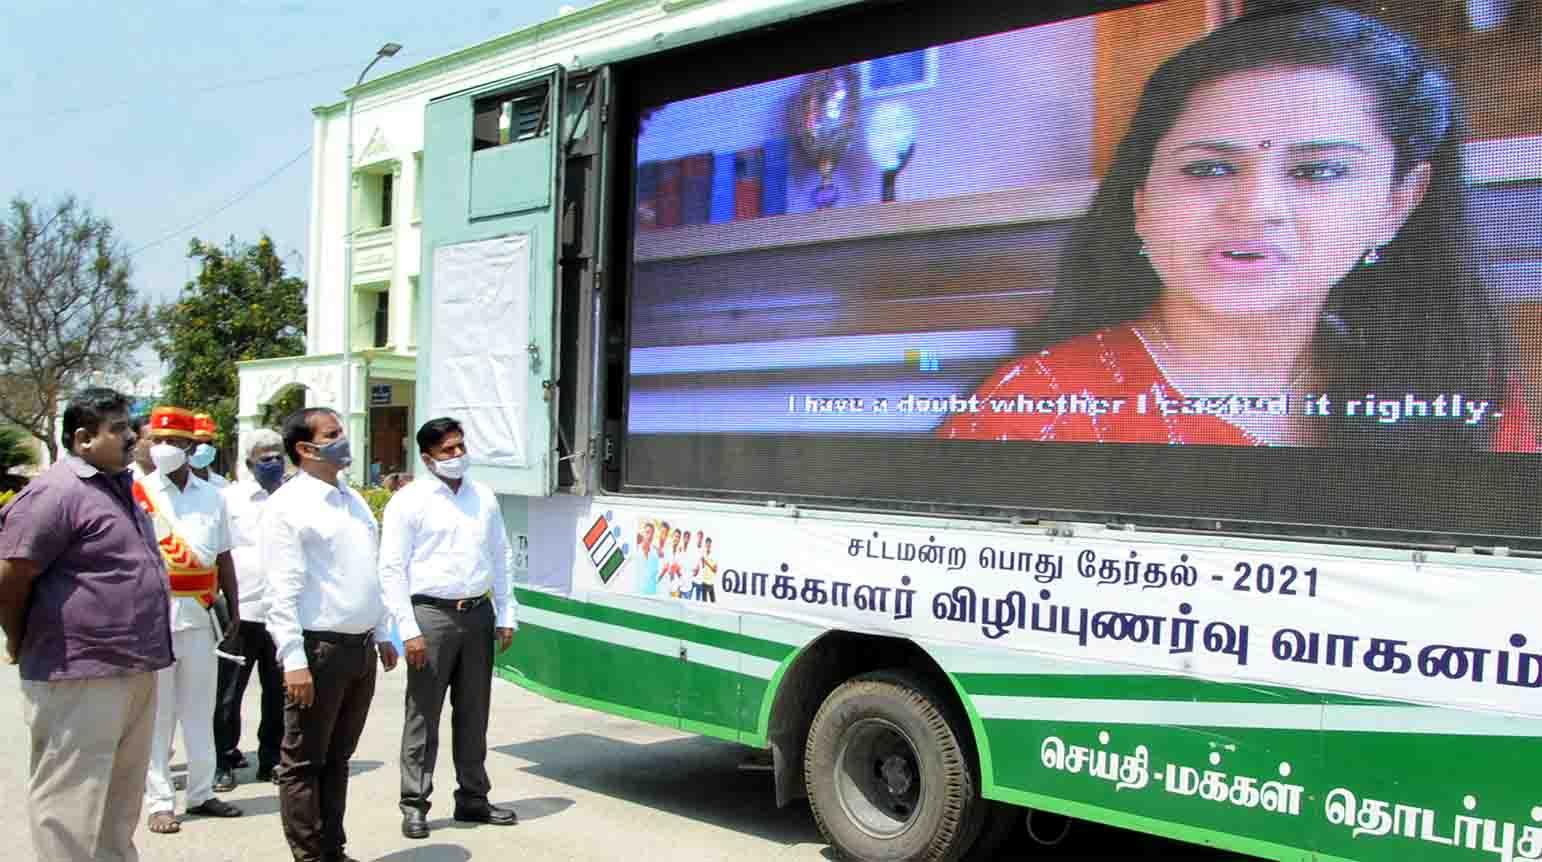 Awareness vehicle